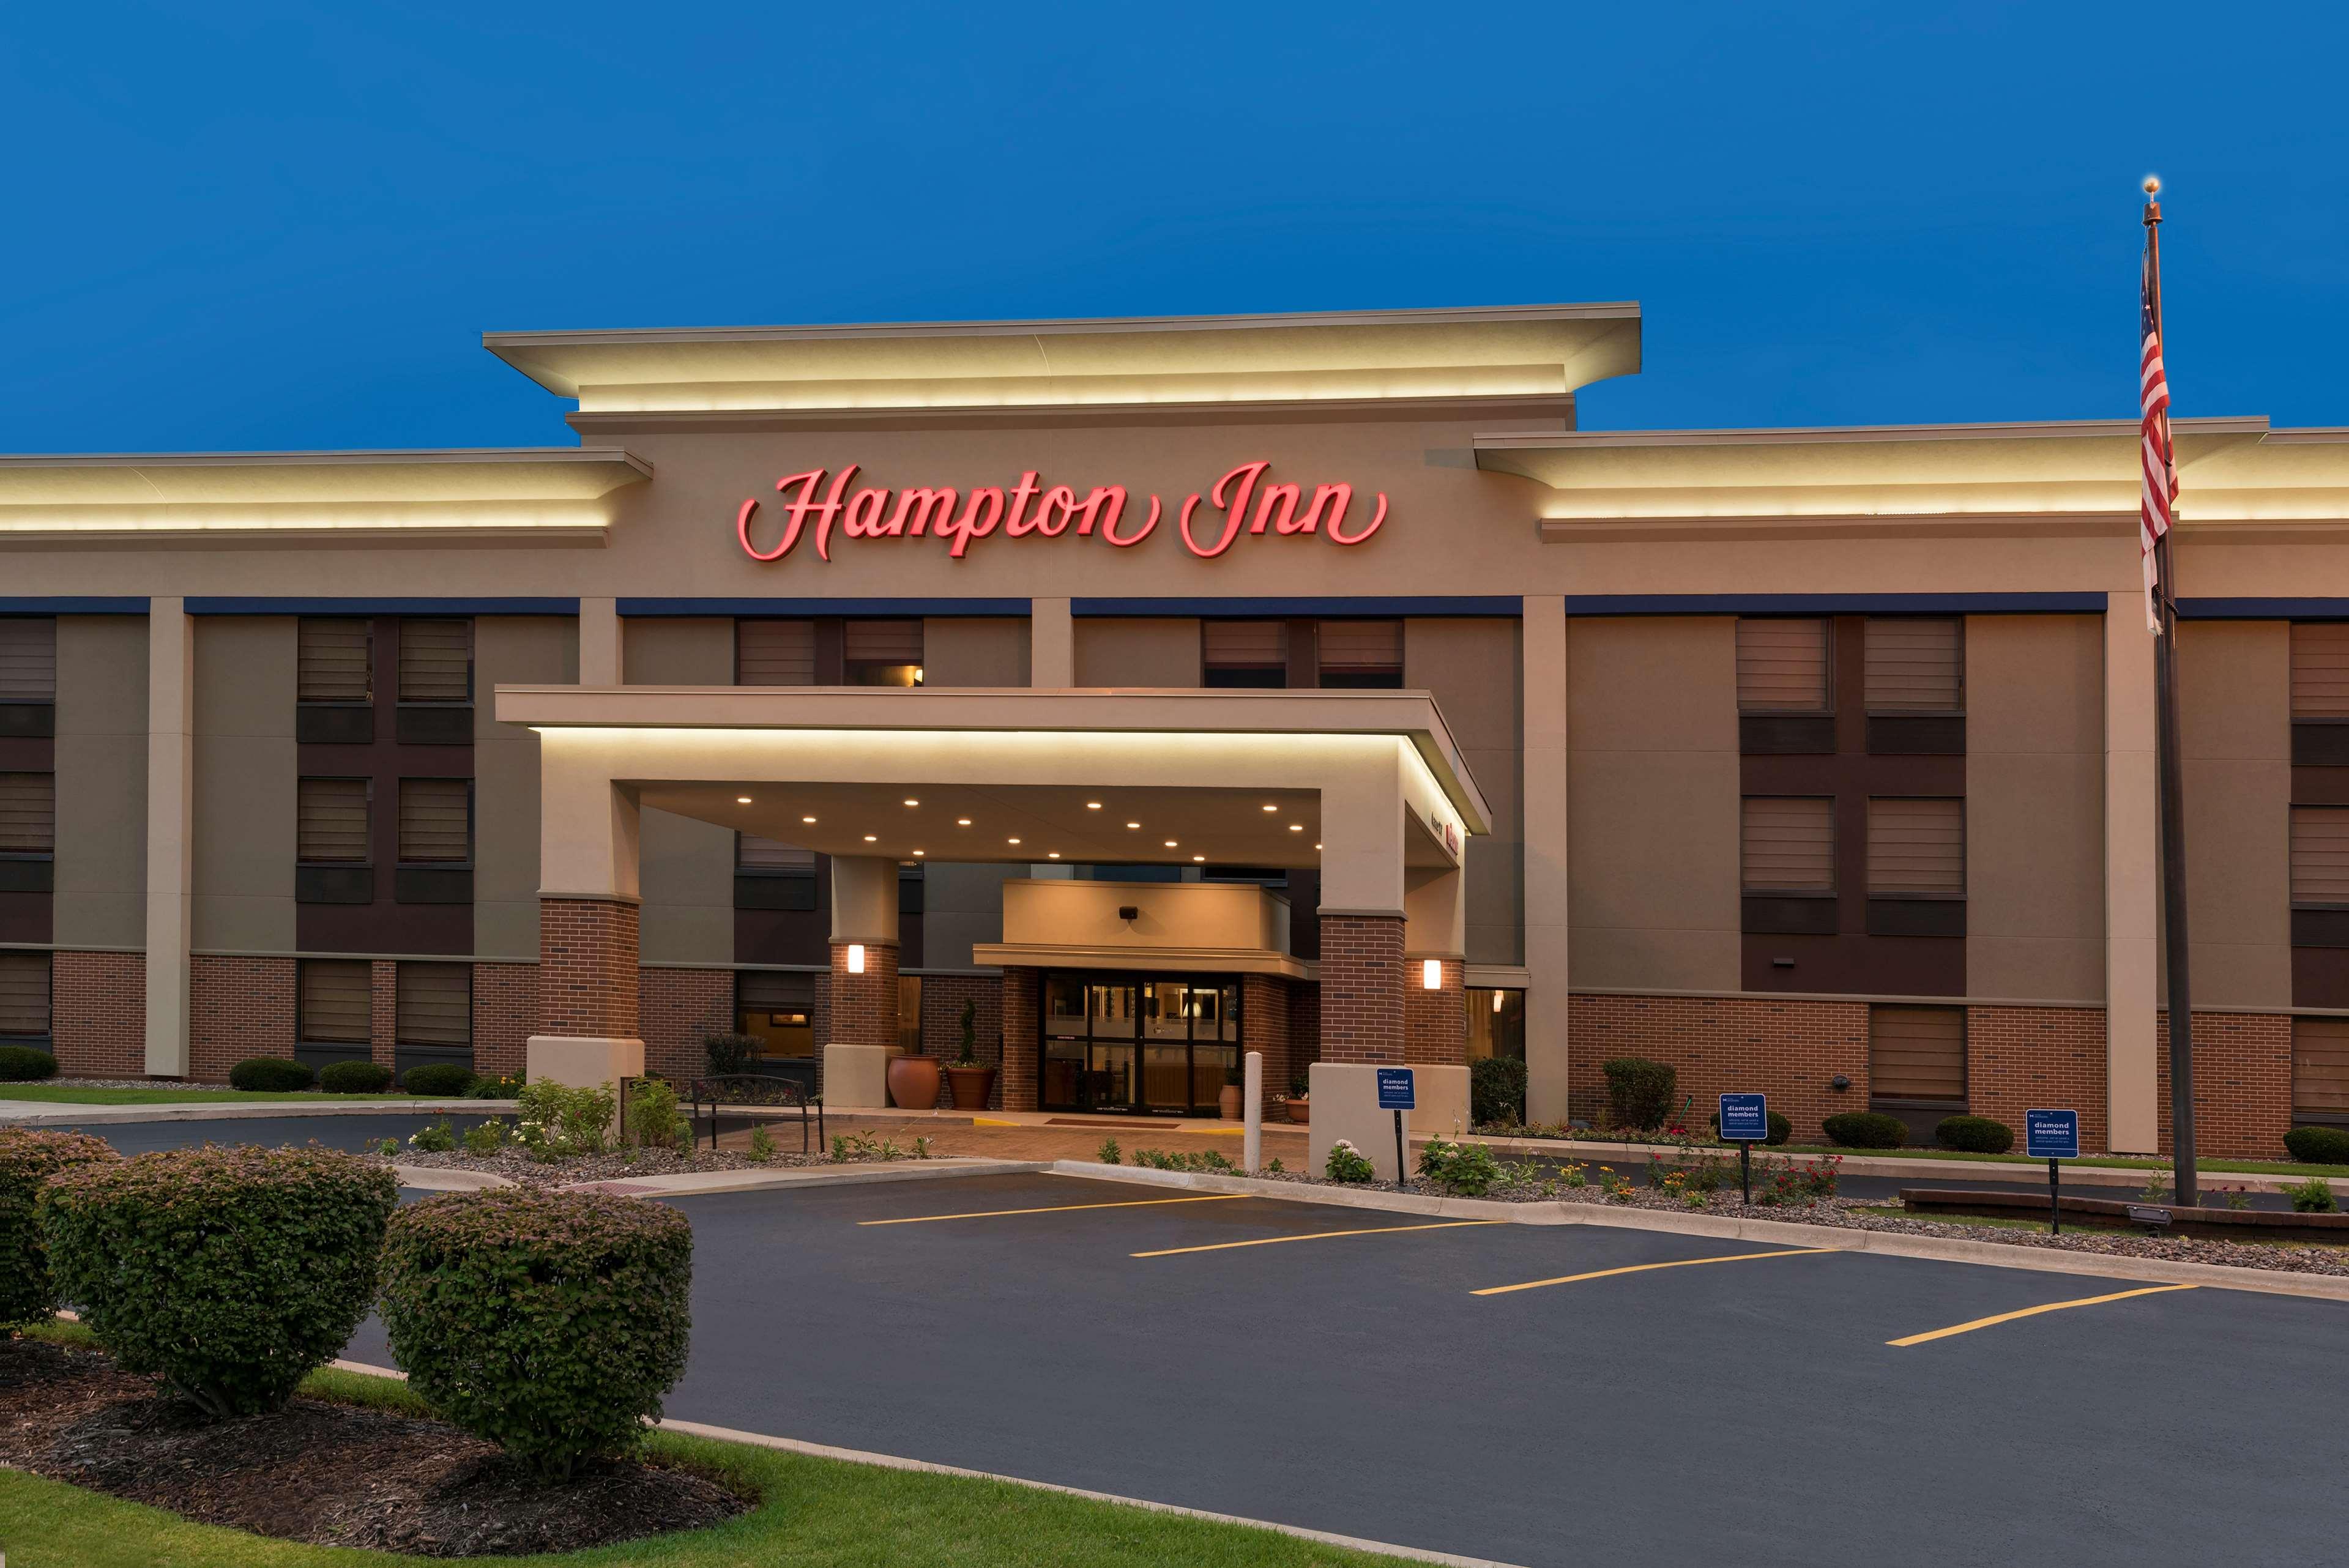 Hampton Inn Joliet - I-80 image 2